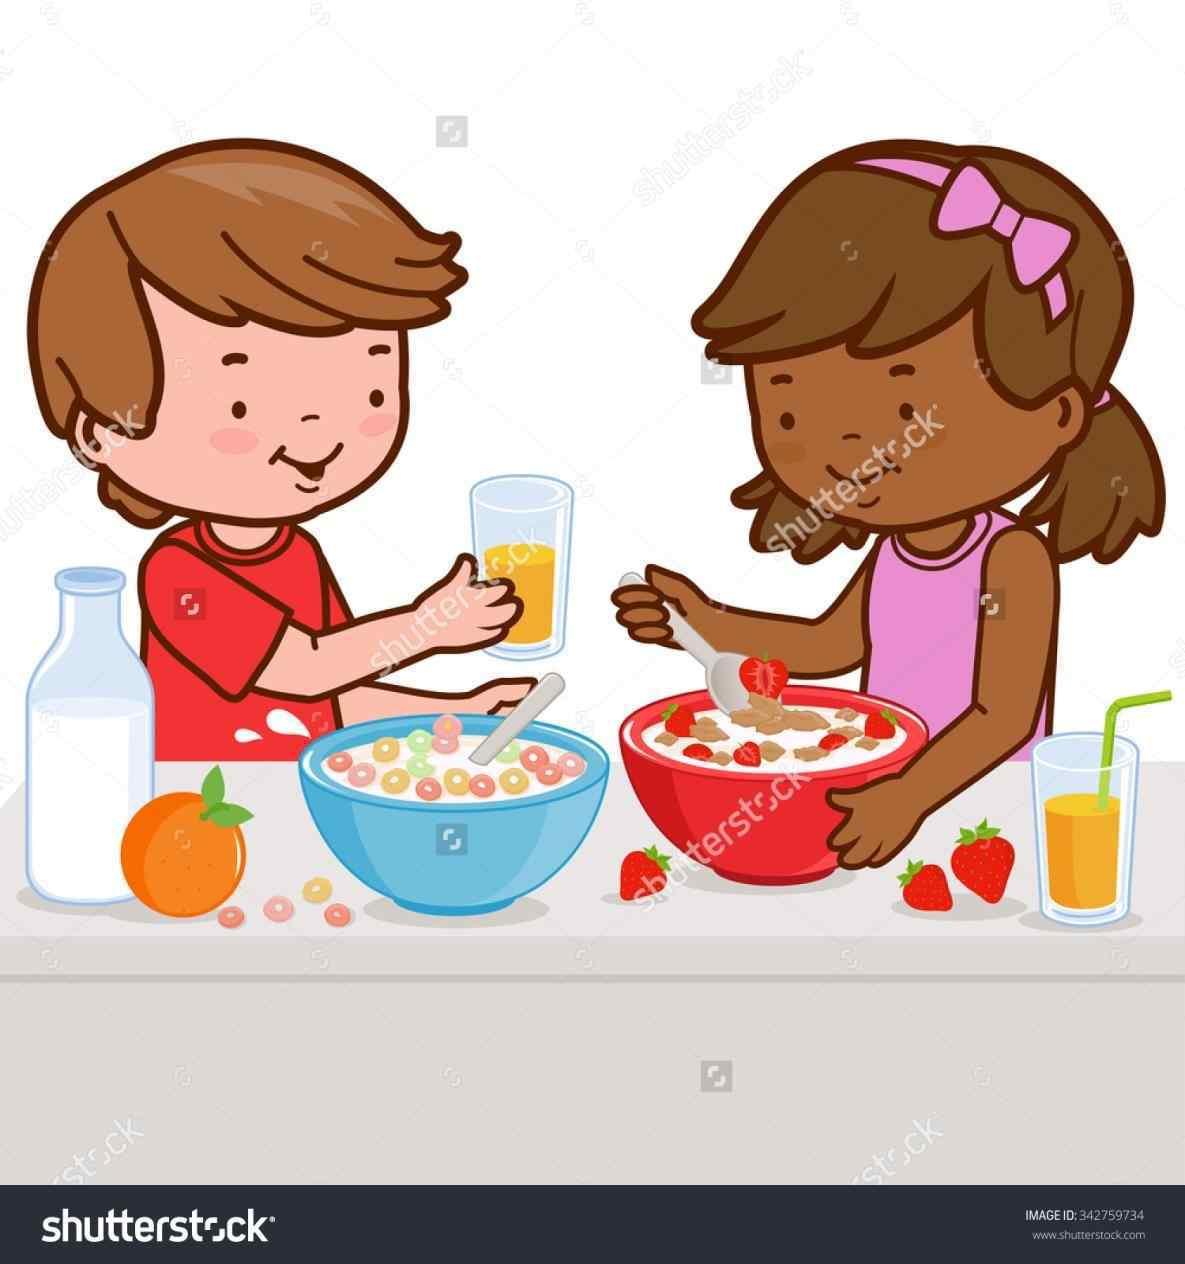 Breakfast clipart preschool. Healthy nutrient pencil and